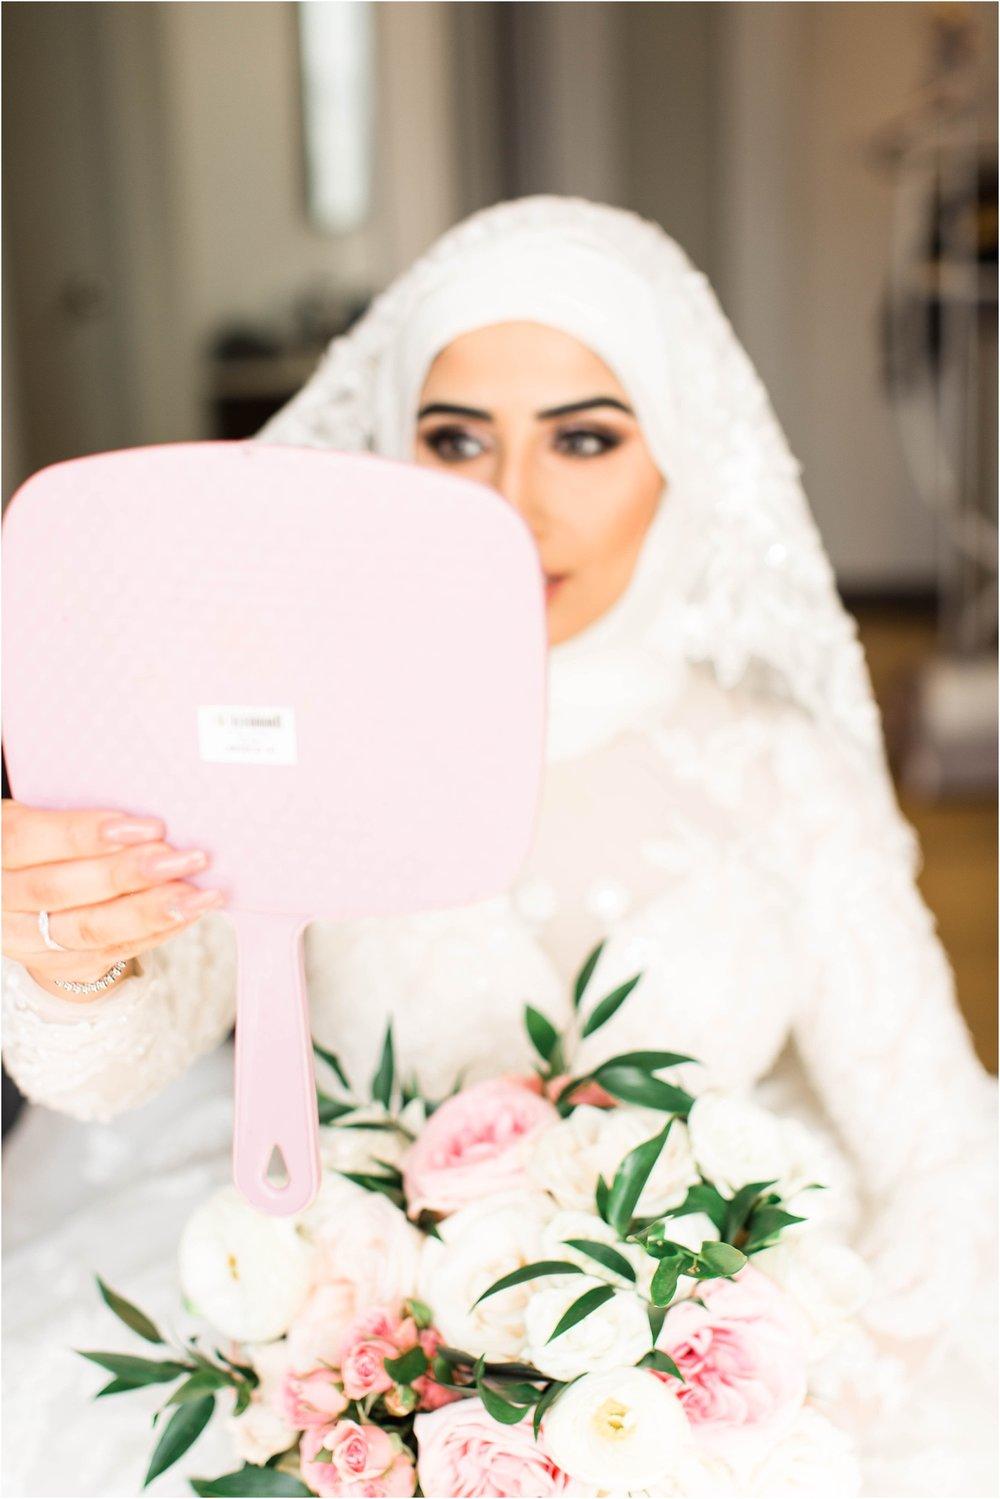 Red-Rose-Convention-Mint-Room-Wedding-Toronto-Mississauga-Brampton-Scarborough-GTA-Pakistani-Indian-Wedding-Engagement-Photographer-Photography_0090.jpg